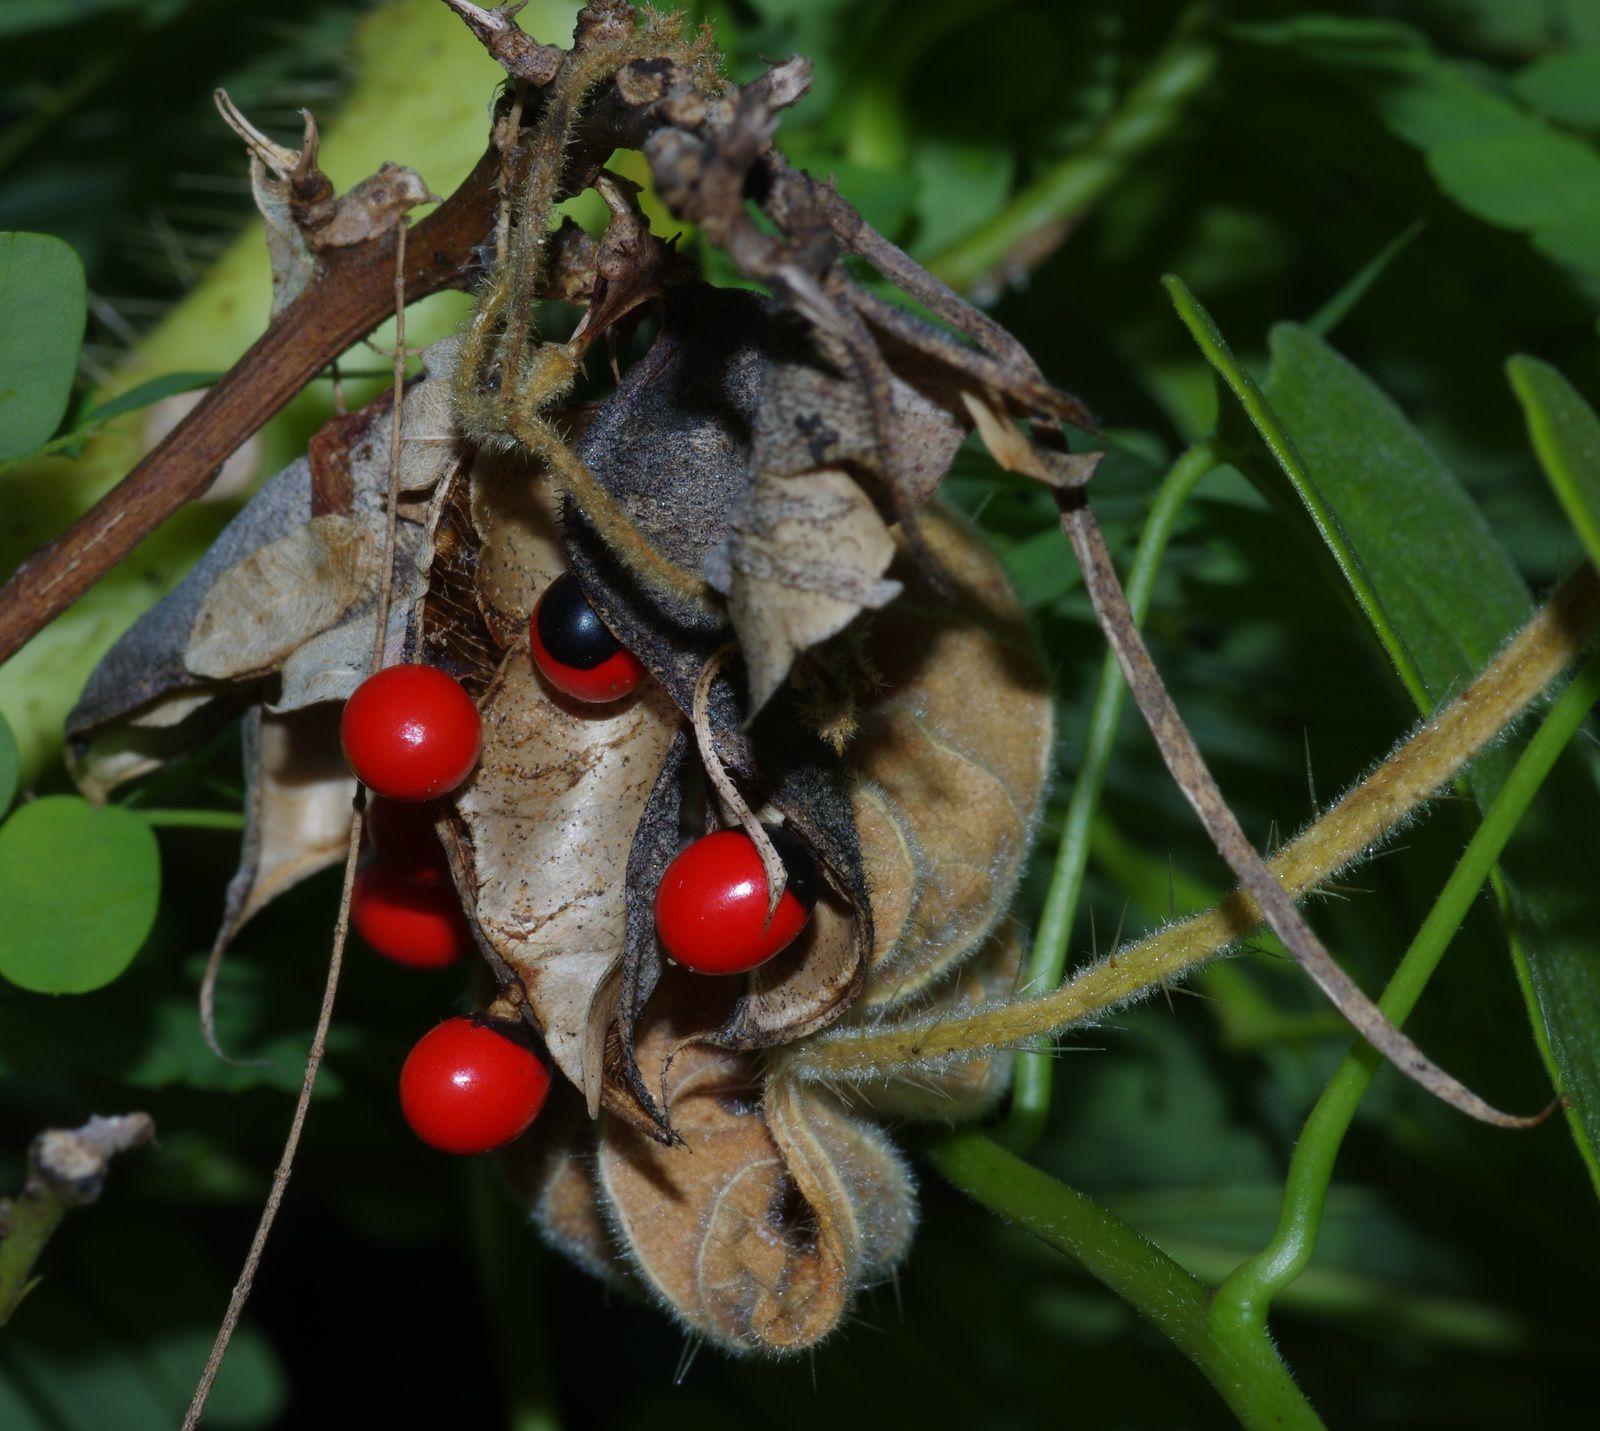 Abrus precatorius (ti panacoco, pois rouge, haricot paternoster)